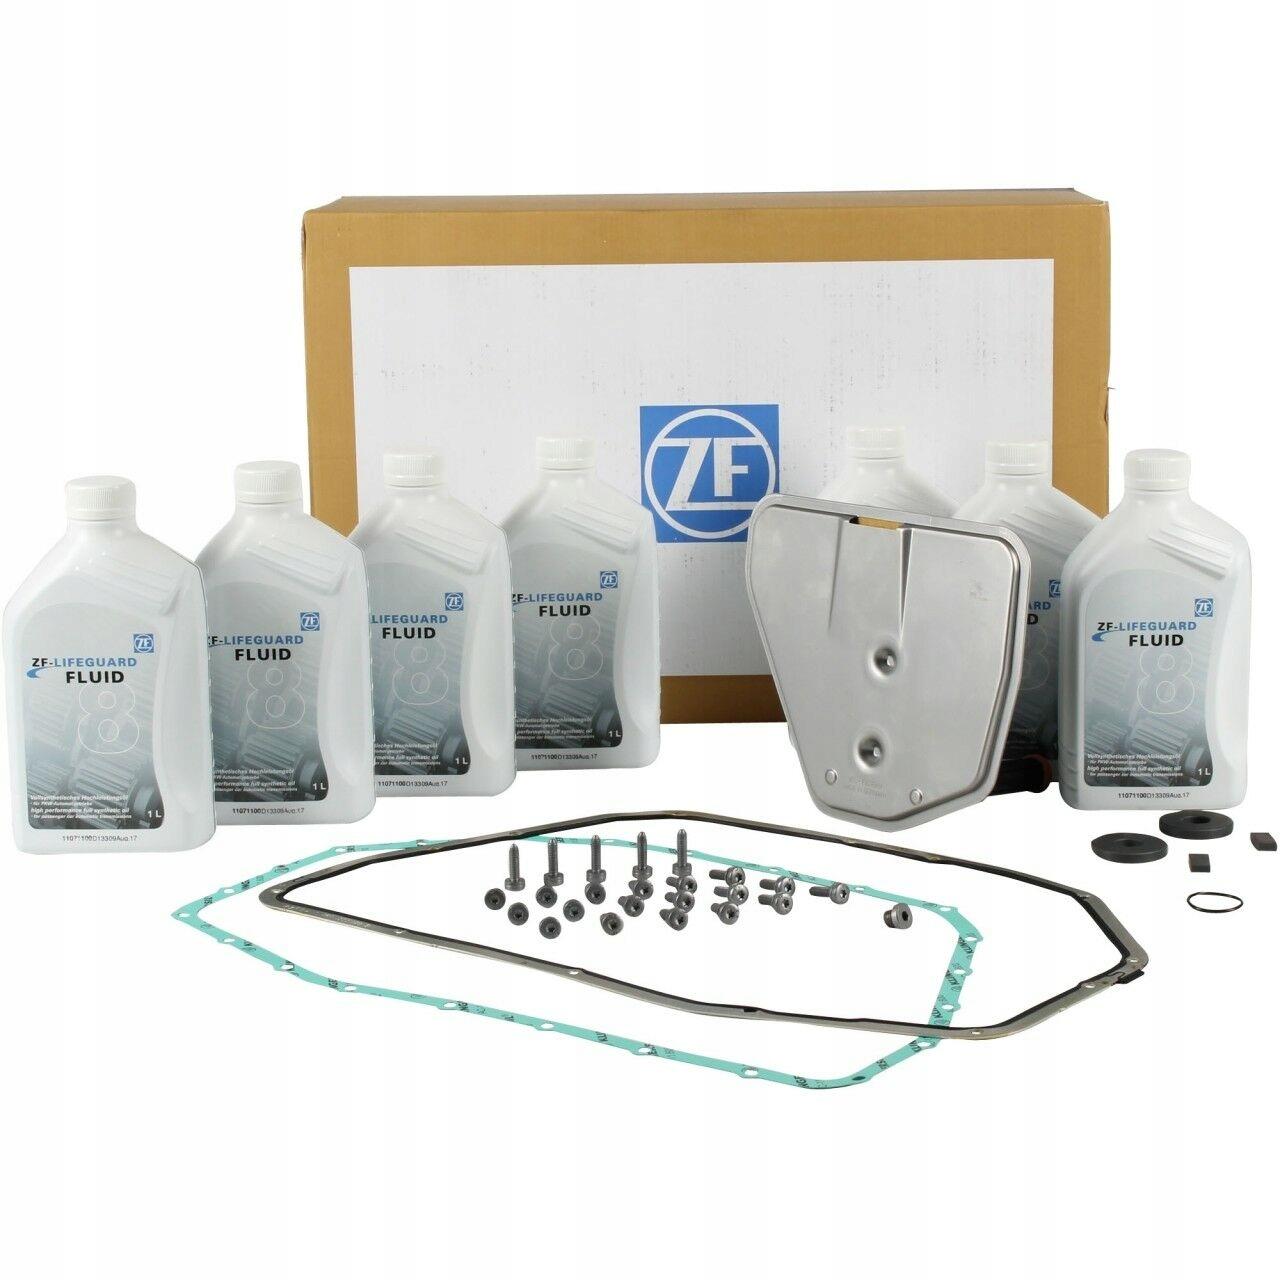 zf фильтр масло прокладка audi a6 c6 a8 6hp19 комплект